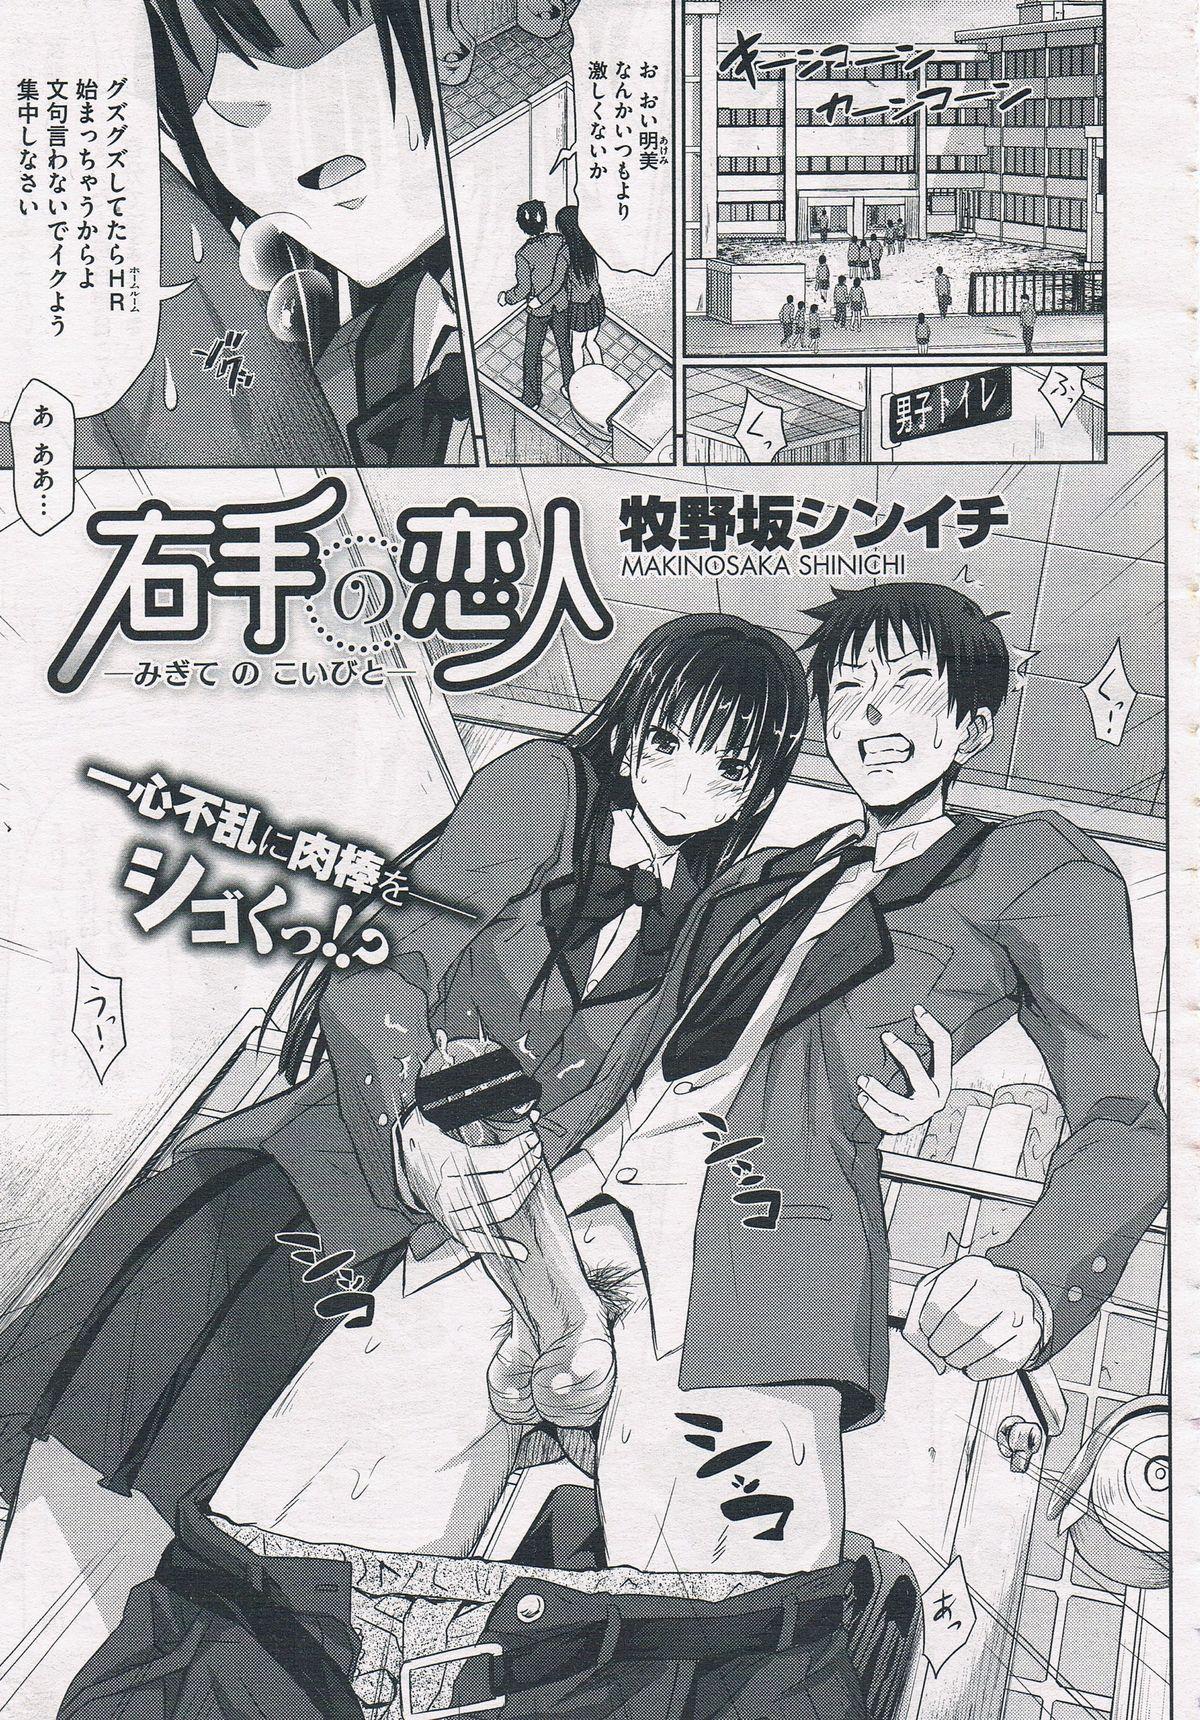 Migite no koibito COMIC Megastore 2012-07 0